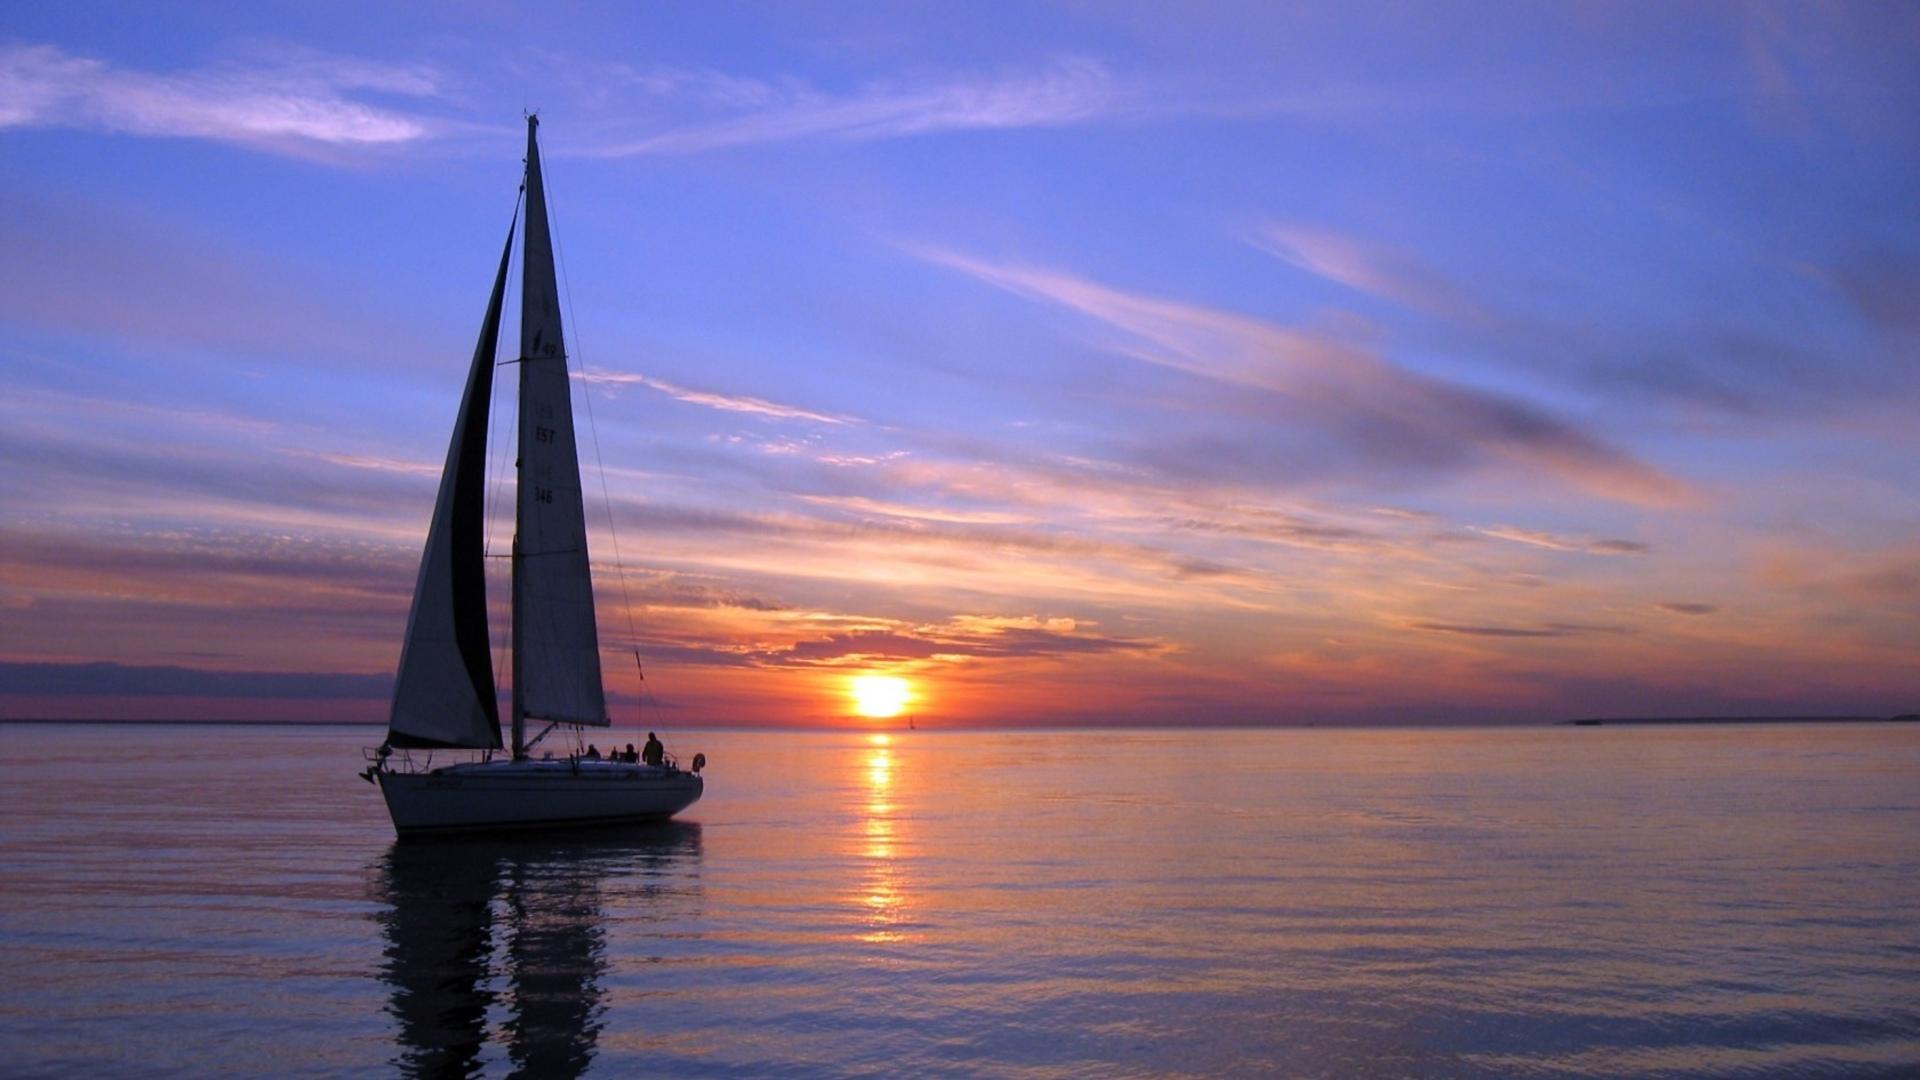 Sunset Sailboat Cruise Myrtle Beach